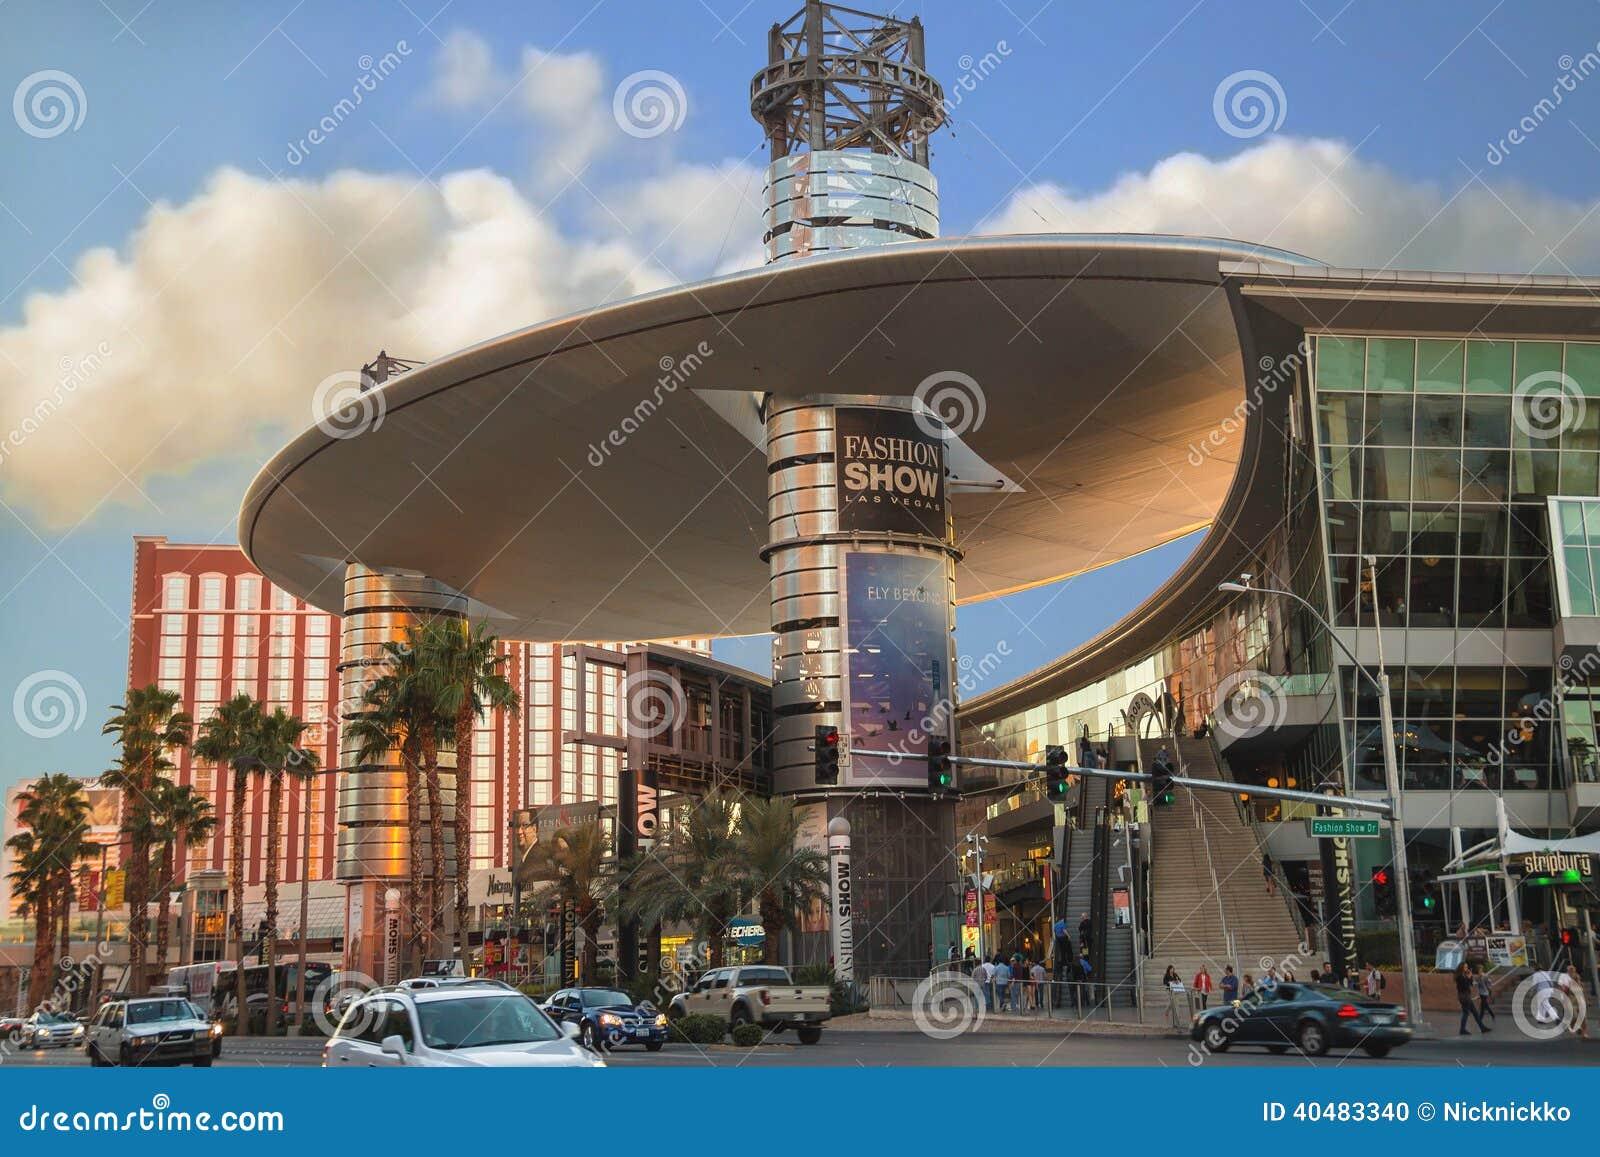 Fashion Show Mall In Las Vegas, Nevada. Editorial Image